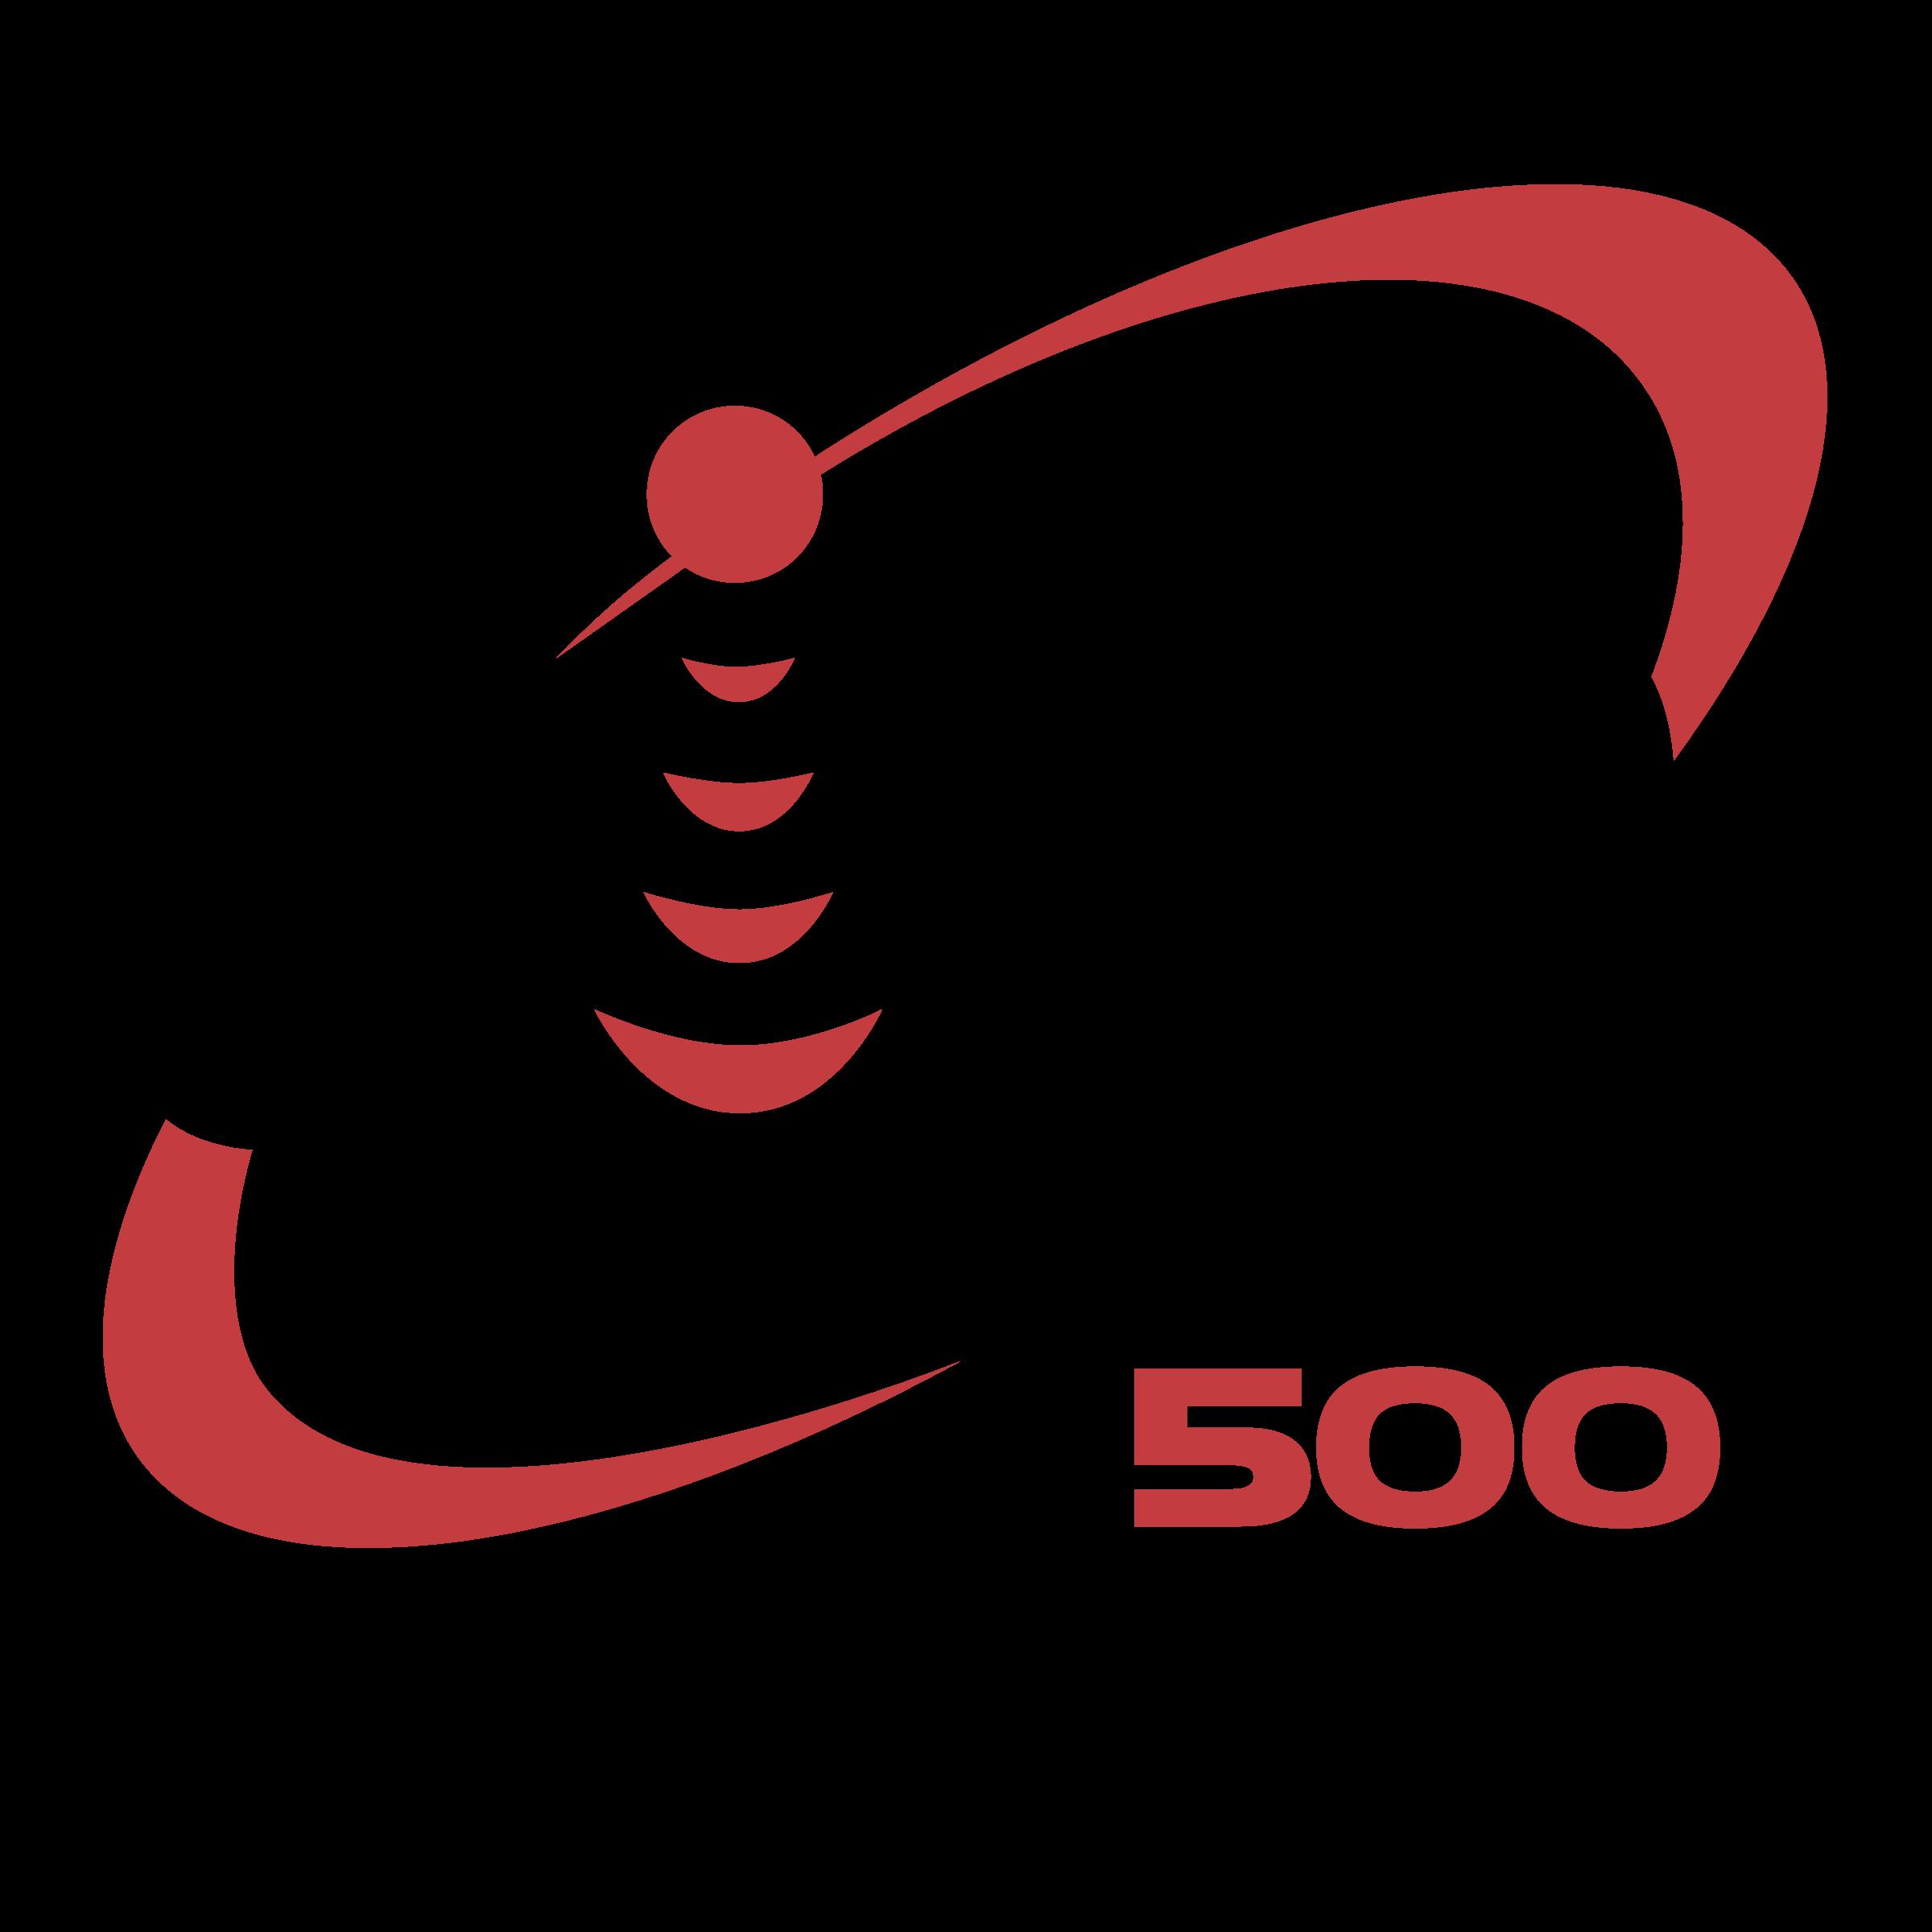 Dish 500 Logo PNG Transparent & SVG Vector.